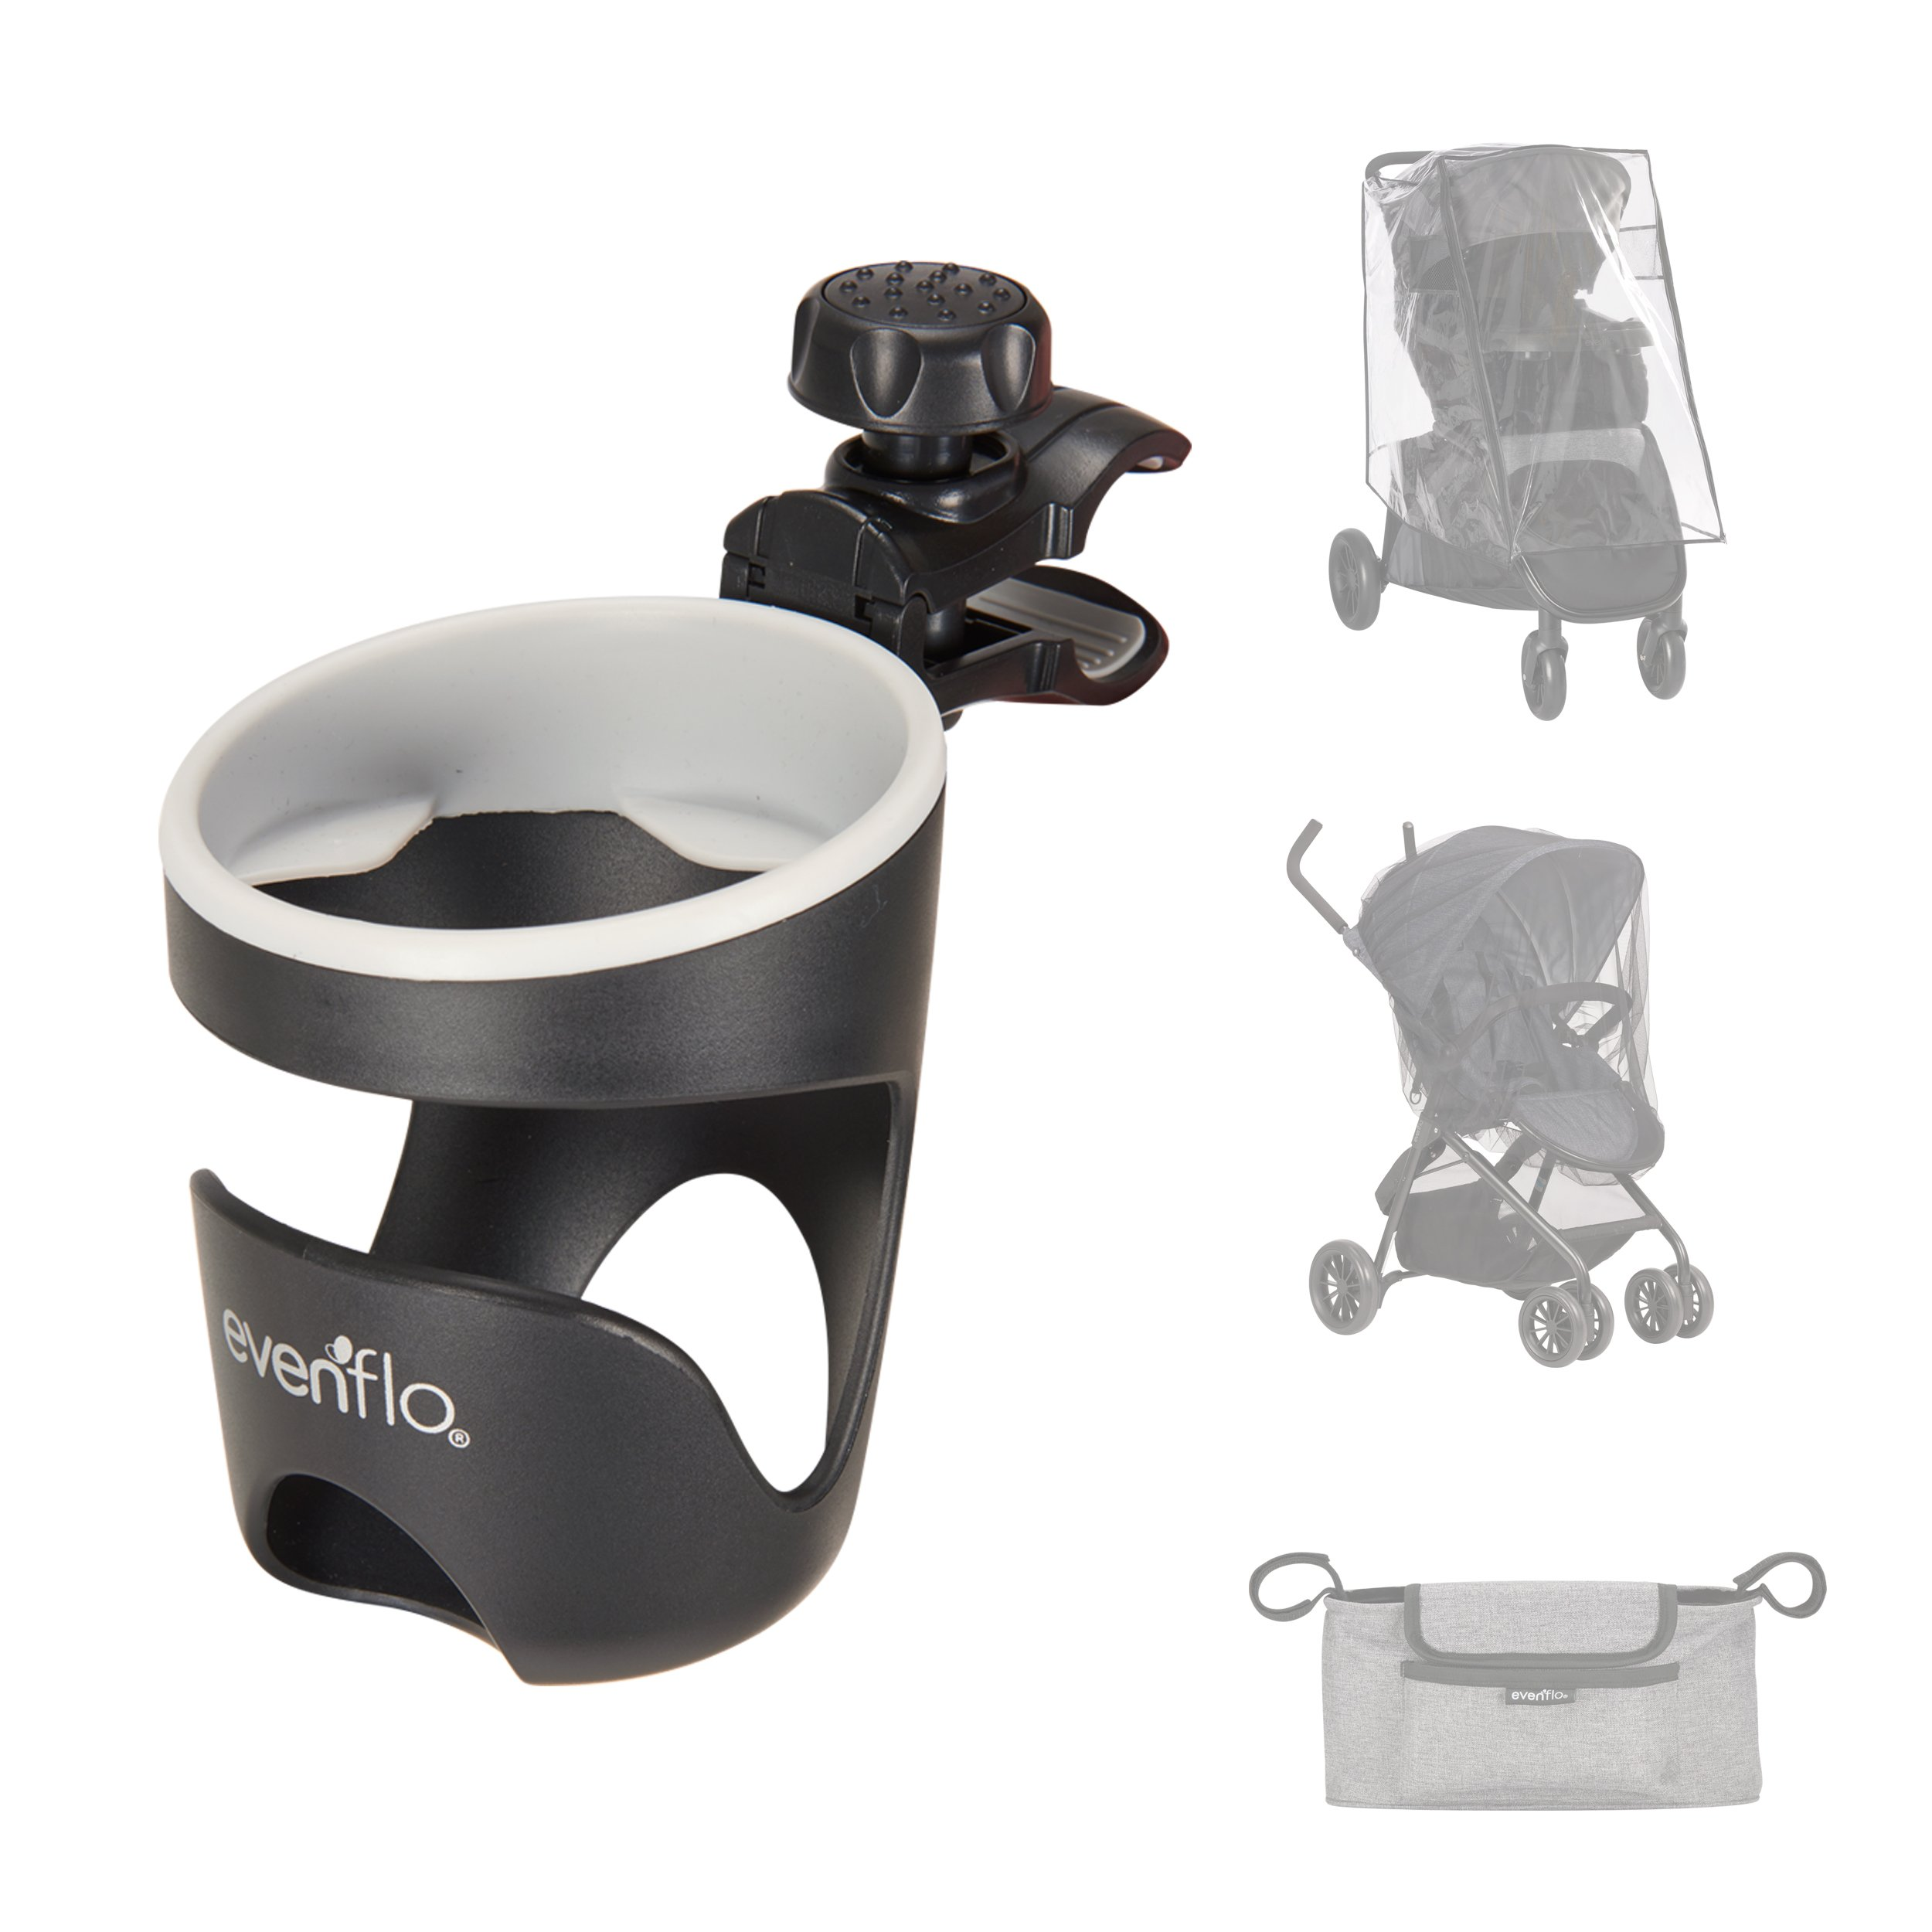 Evenflo Stroller Accessories Starter Kit by Evenflo (Image #4)